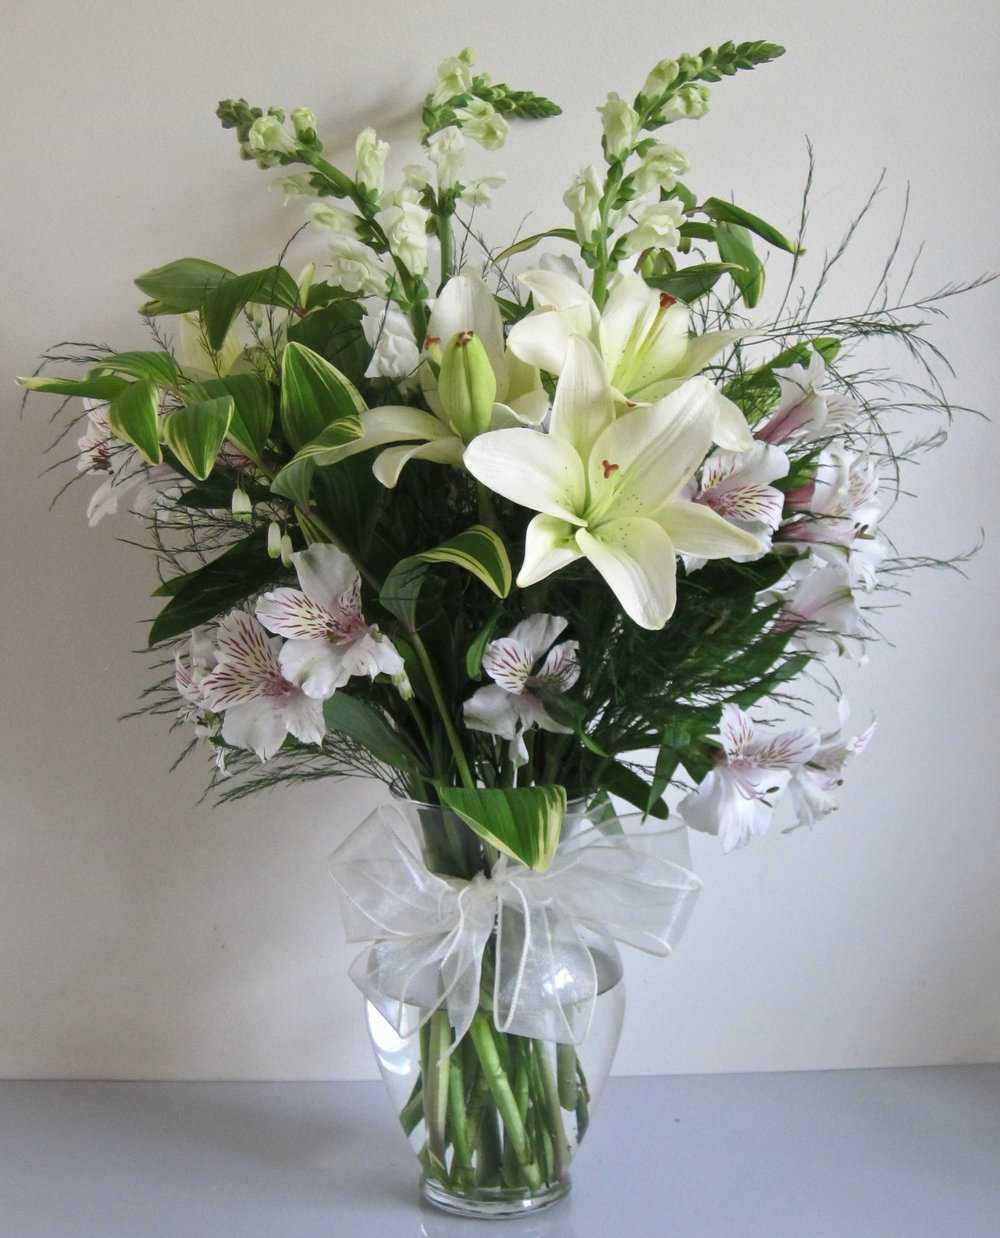 ALTAR ARRANGEMENTS can be done in vases or standing sprays. See Sympathy and Altar Arrangementsfor more samples.